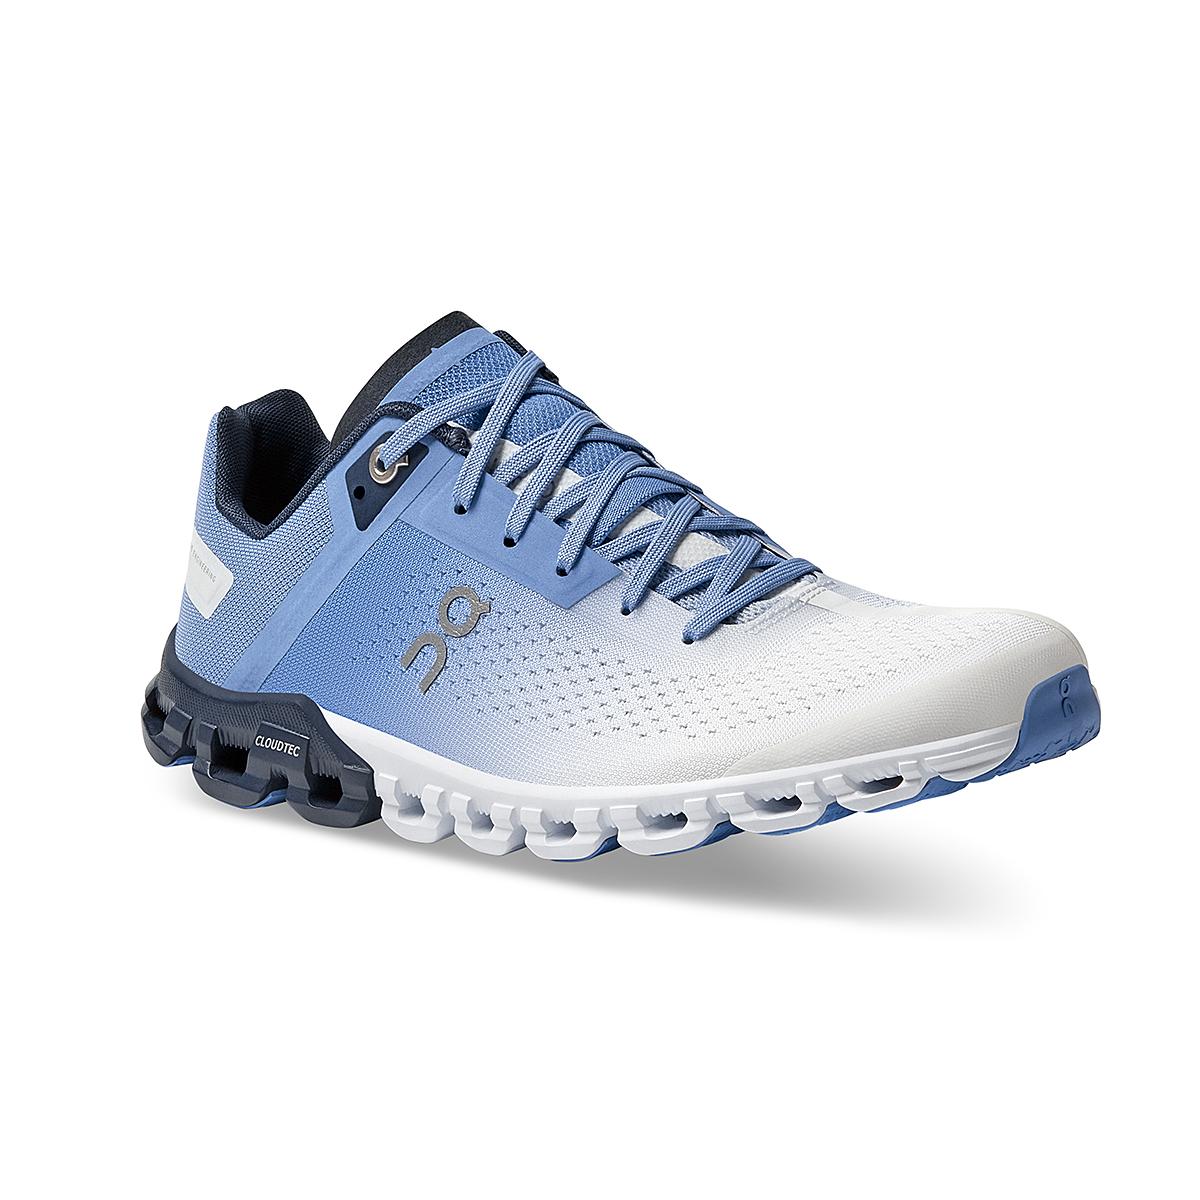 Women's On Cloudflow 3.0 Running Shoe - Color: Marina/White - Size: 5 - Width: Regular, Marina/White, large, image 2